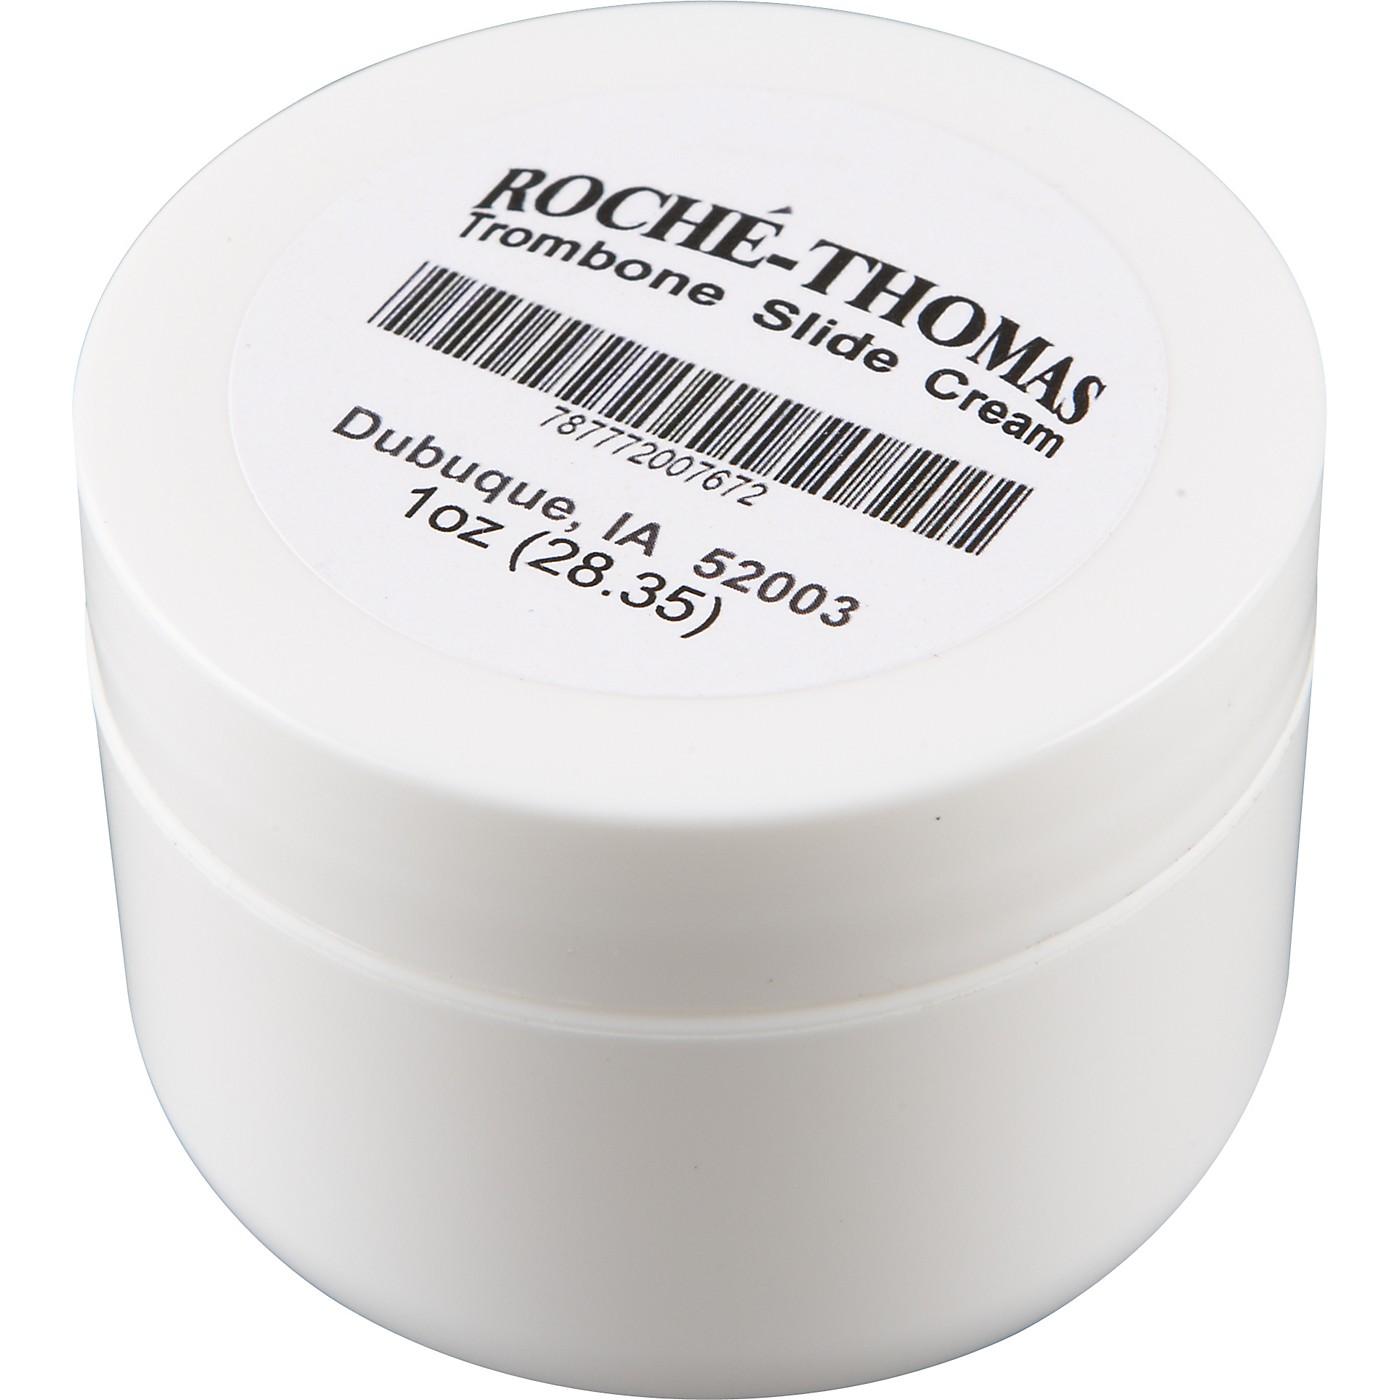 Roche Thomas Trombone Slide Cream thumbnail